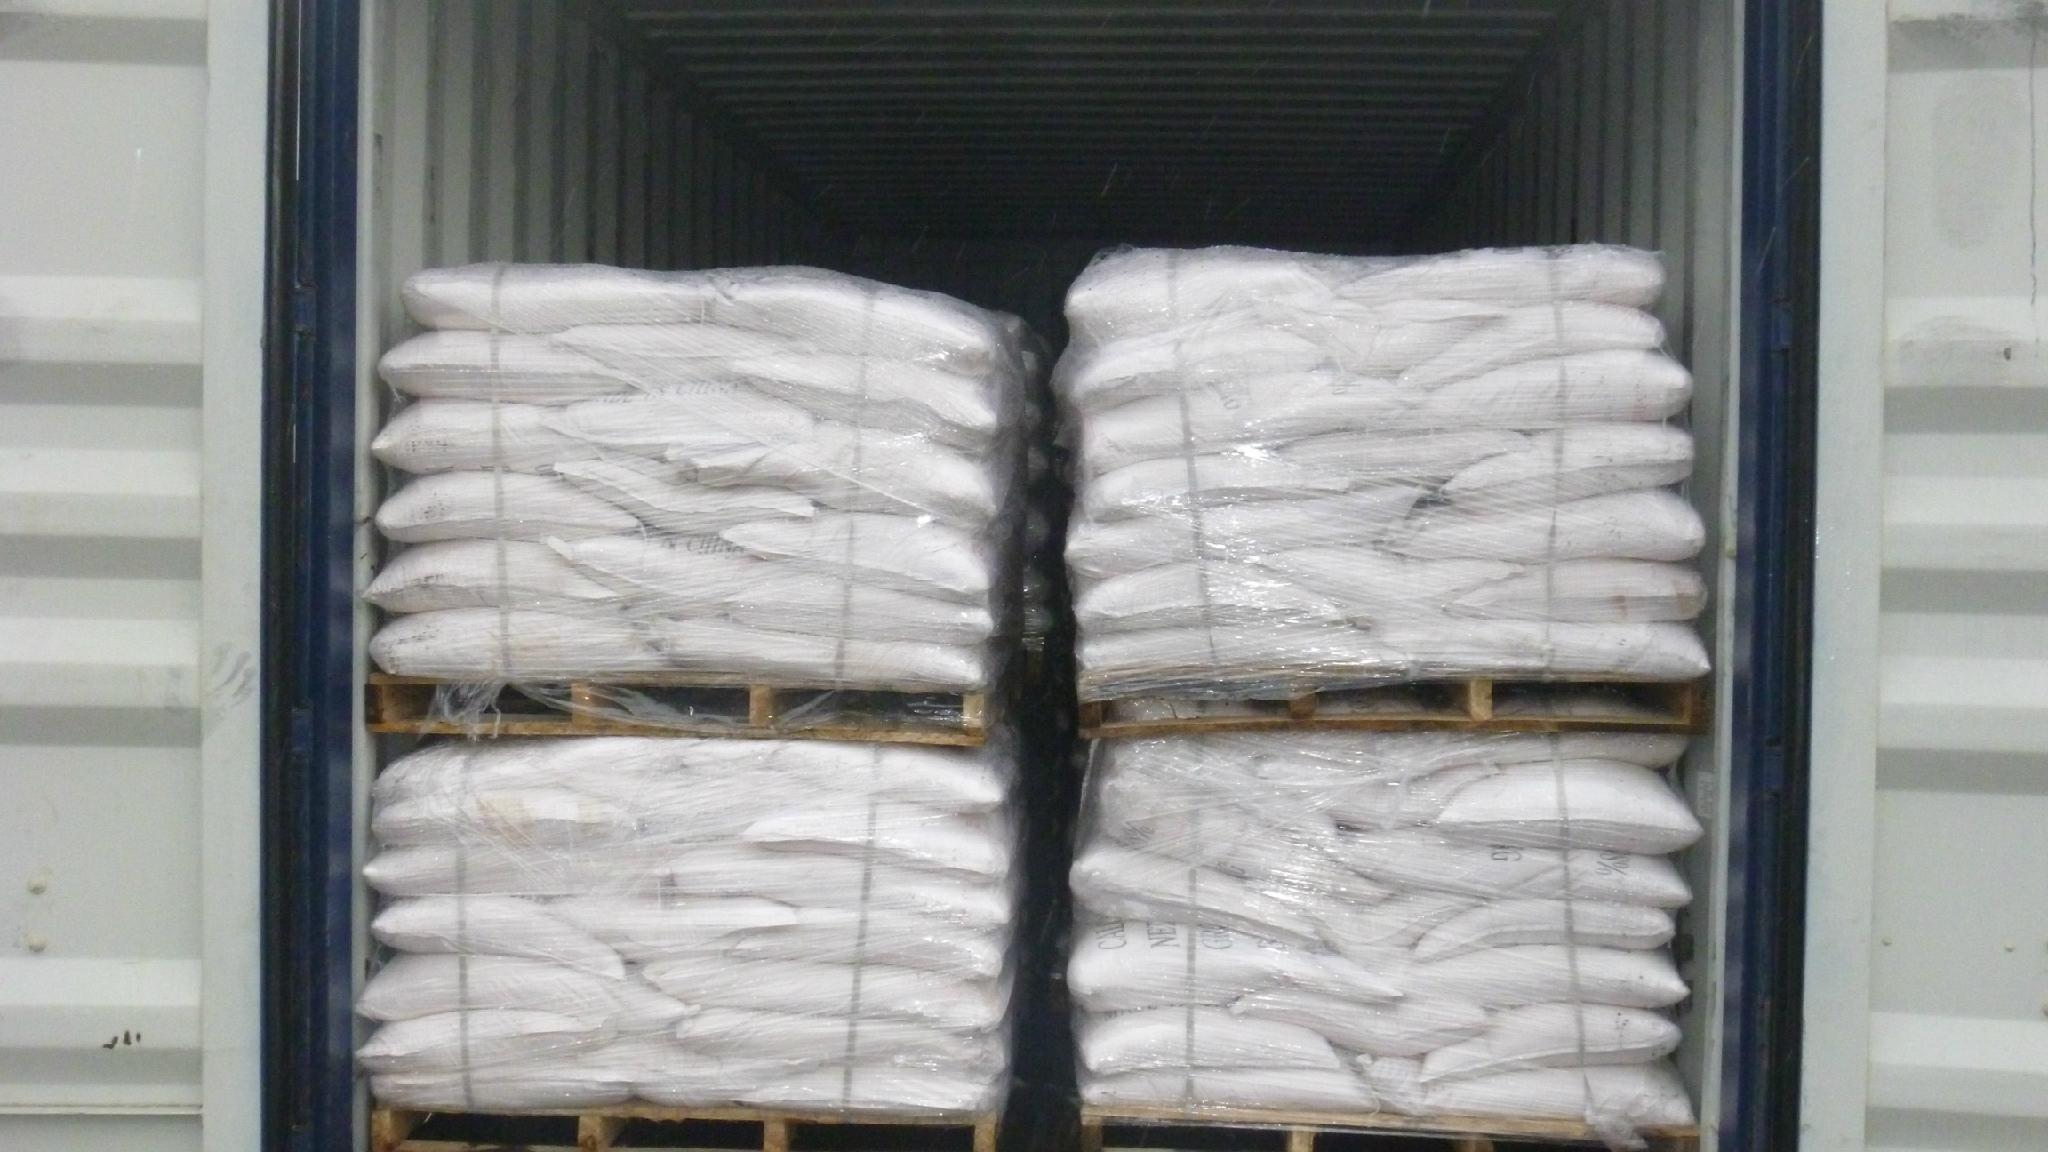 calcium formate use for cement concrete accelerator 5